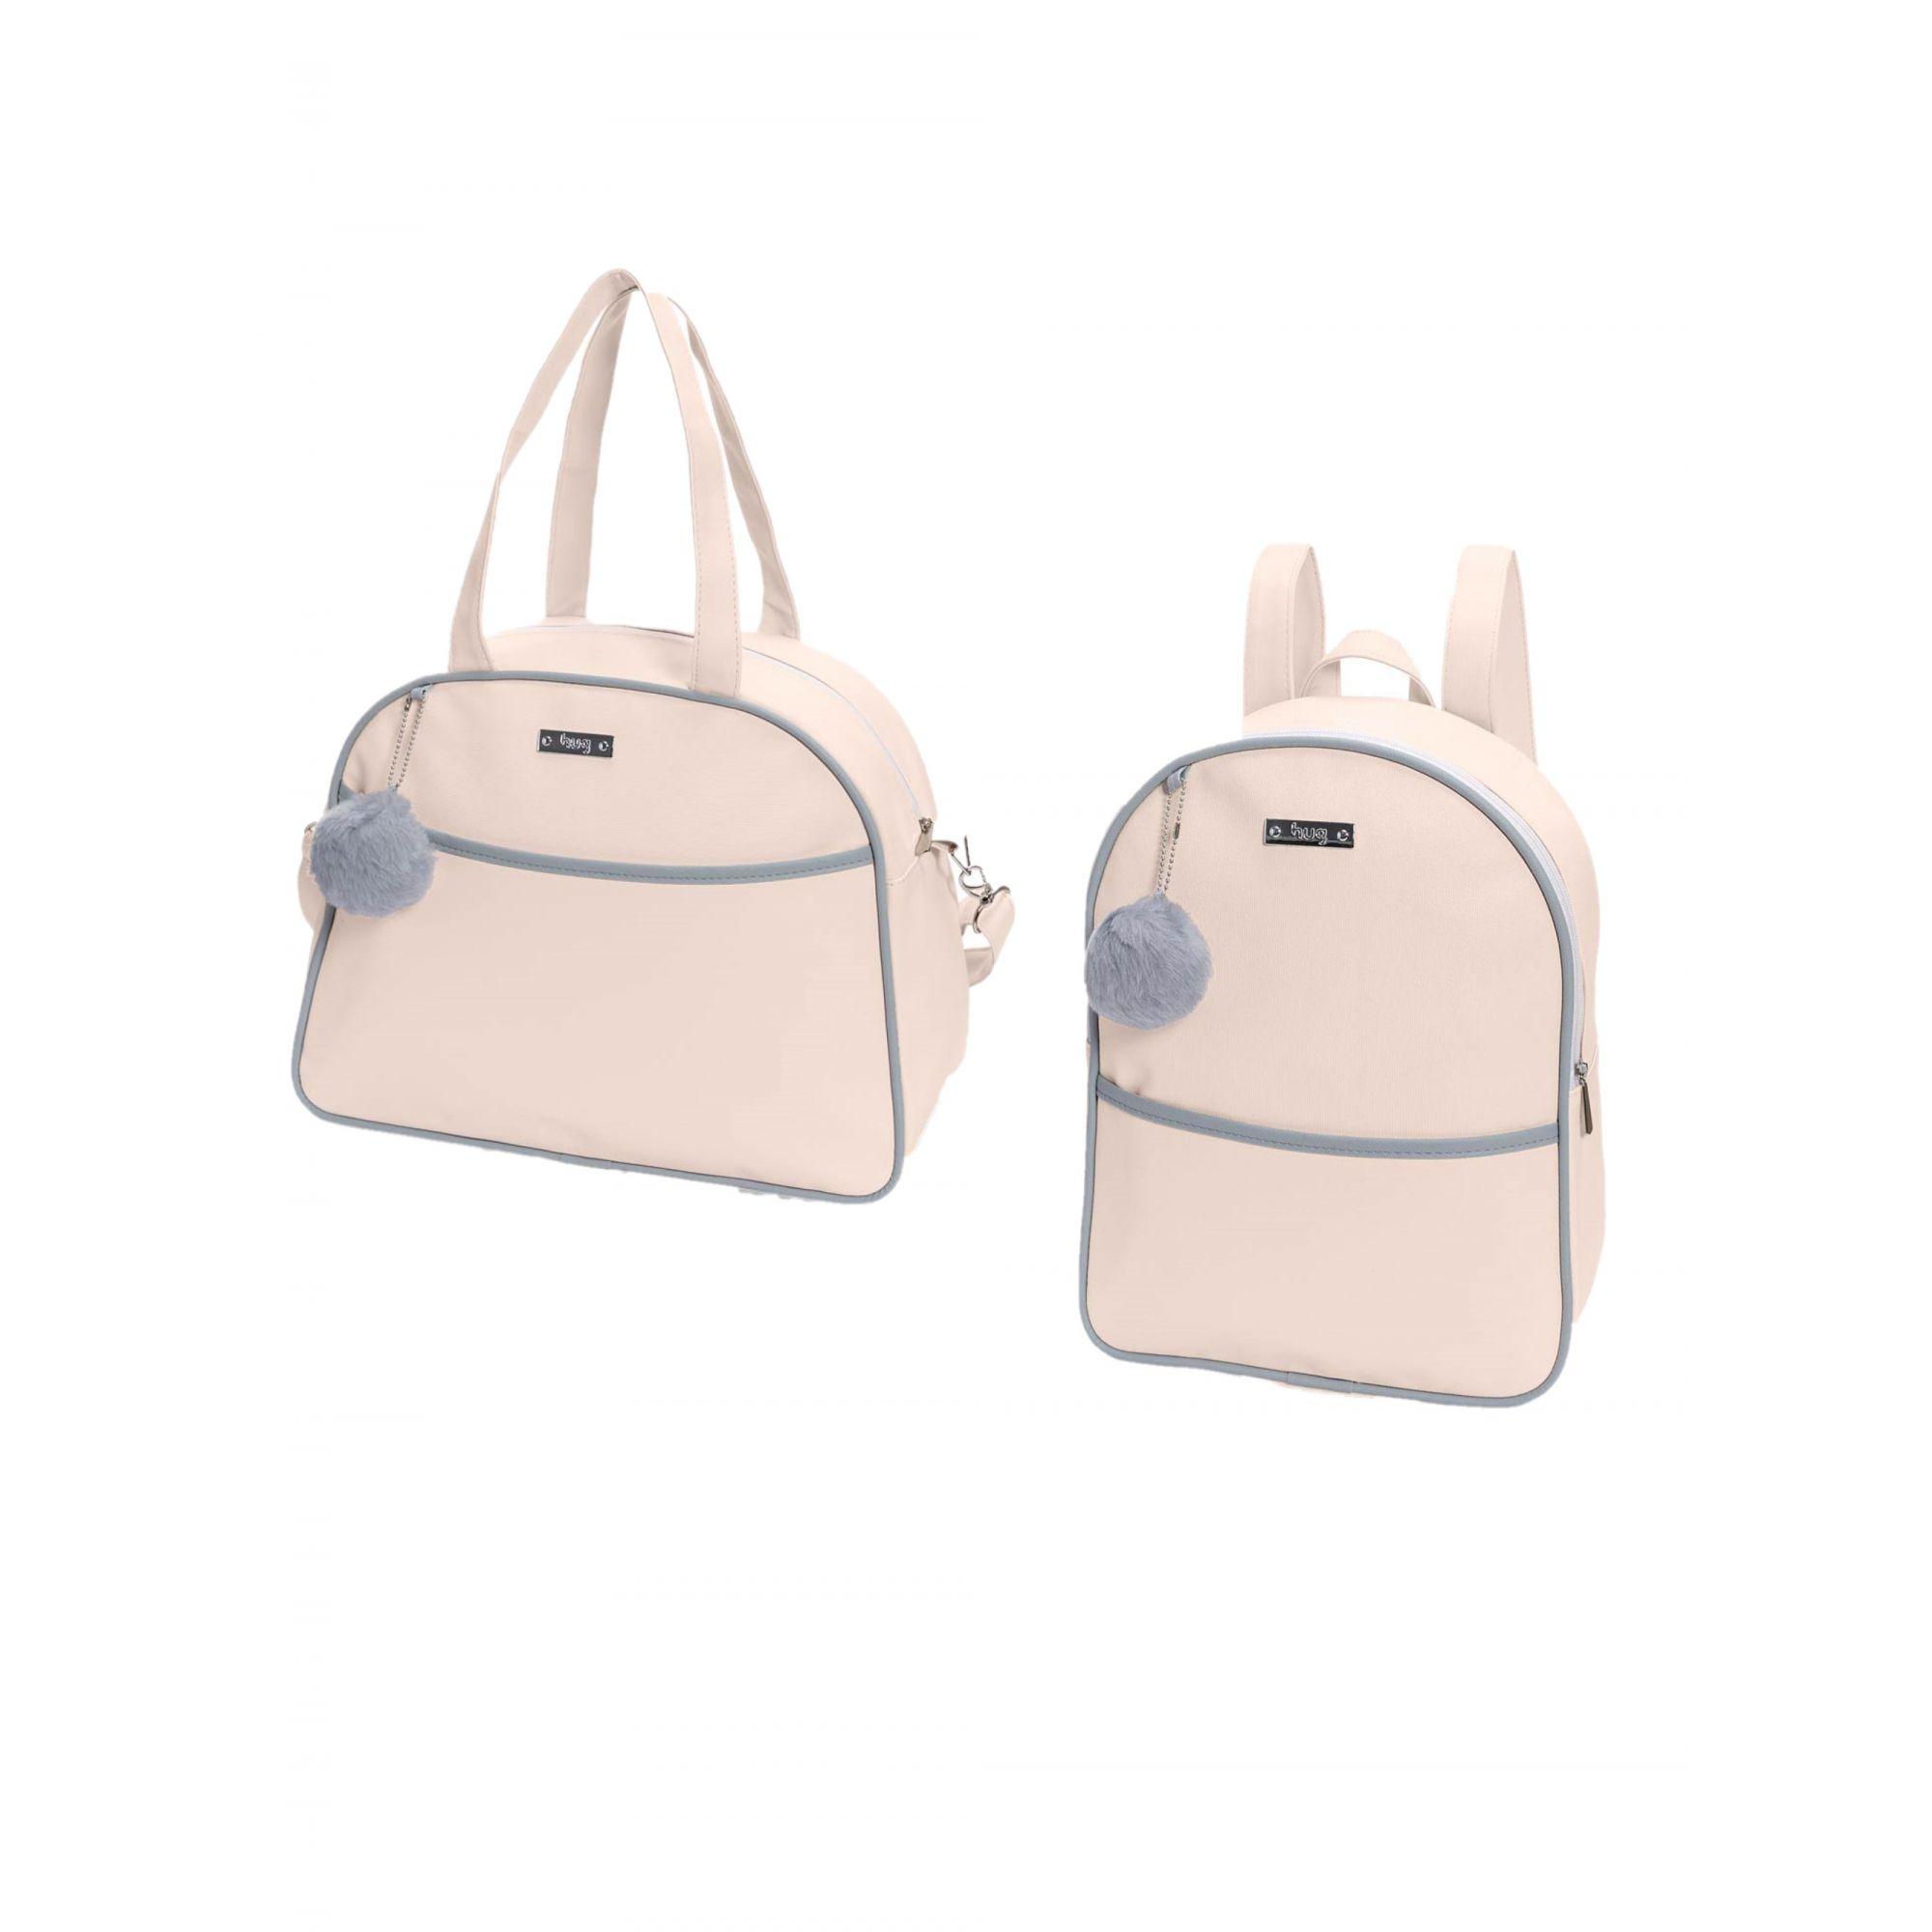 Kit bolsa de maternidade Rosa Berlim - 2 pçs - Hug (bolsa e mochila)